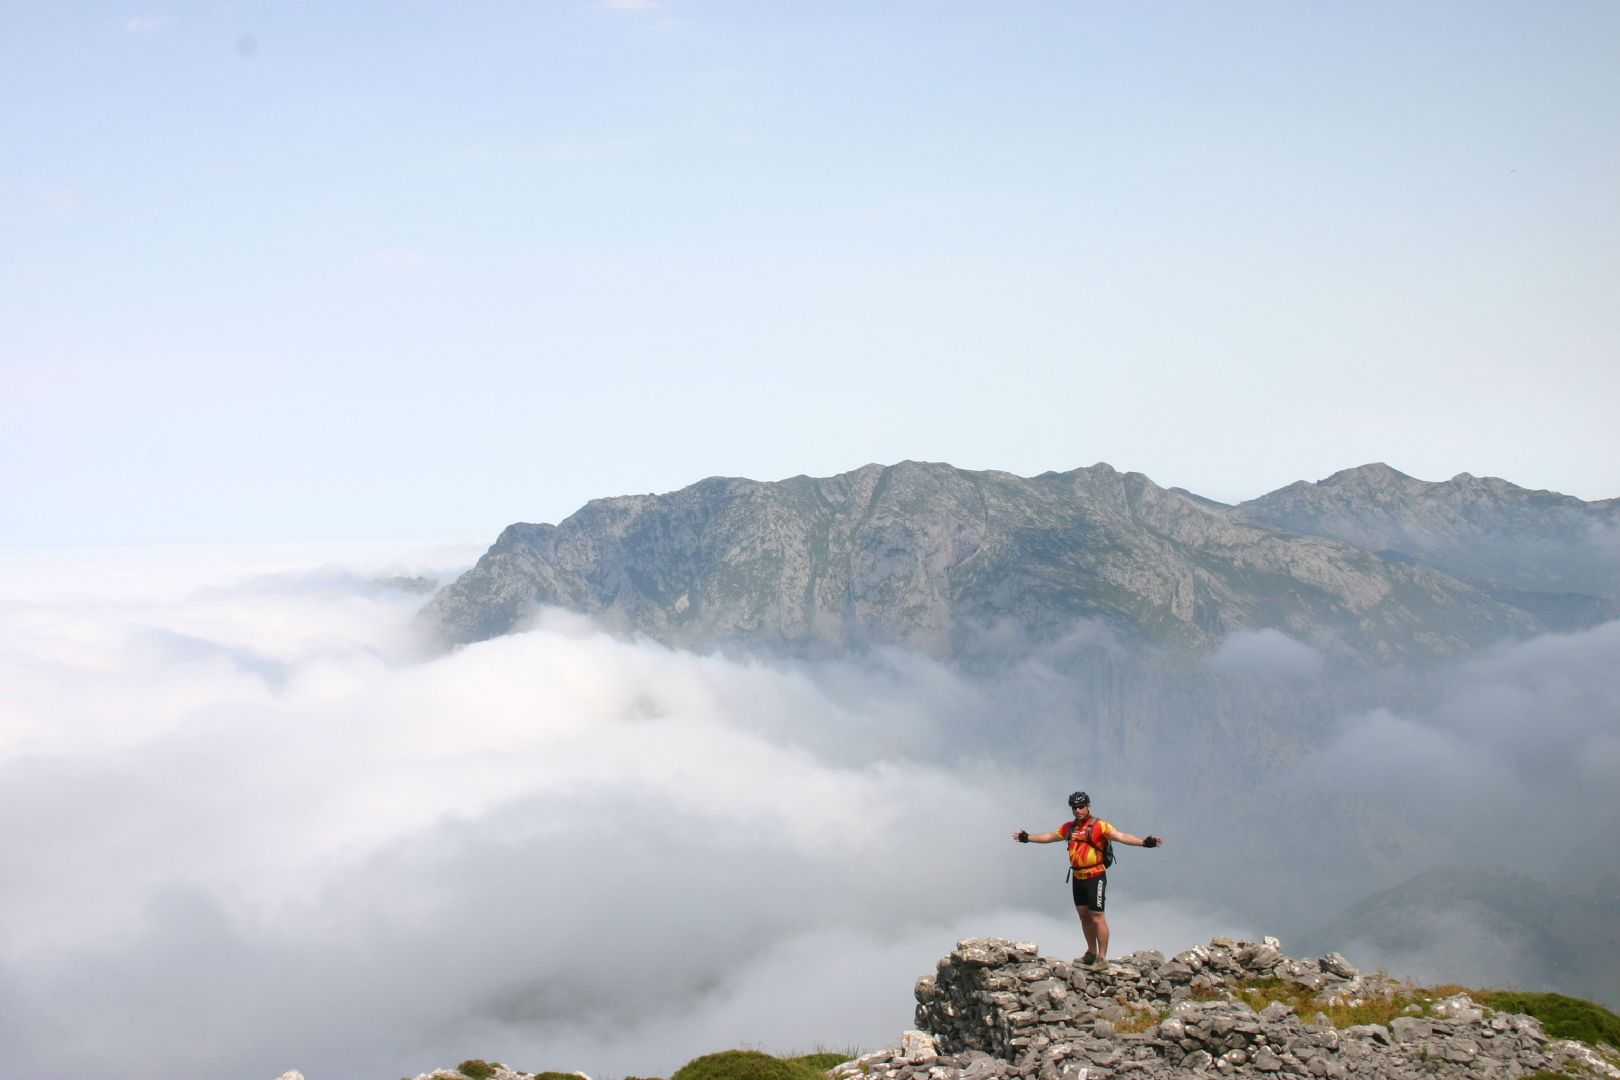 _Holiday.60.5765.jpg - Spain - Picos de Europa - Trans Picos - Guided Mountain Bike Holiday - Mountain Biking